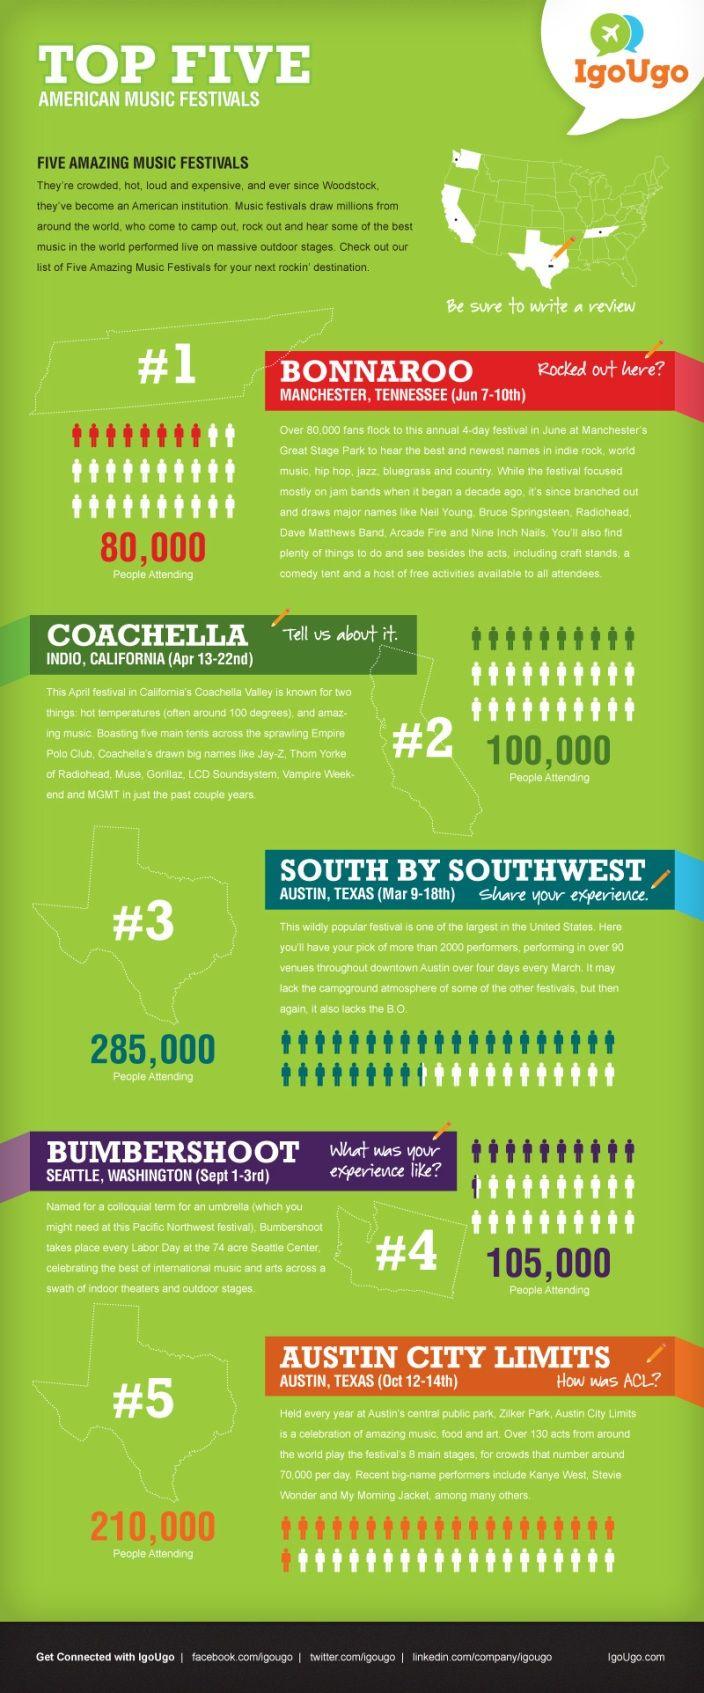 Top 5 American Music Festivals.